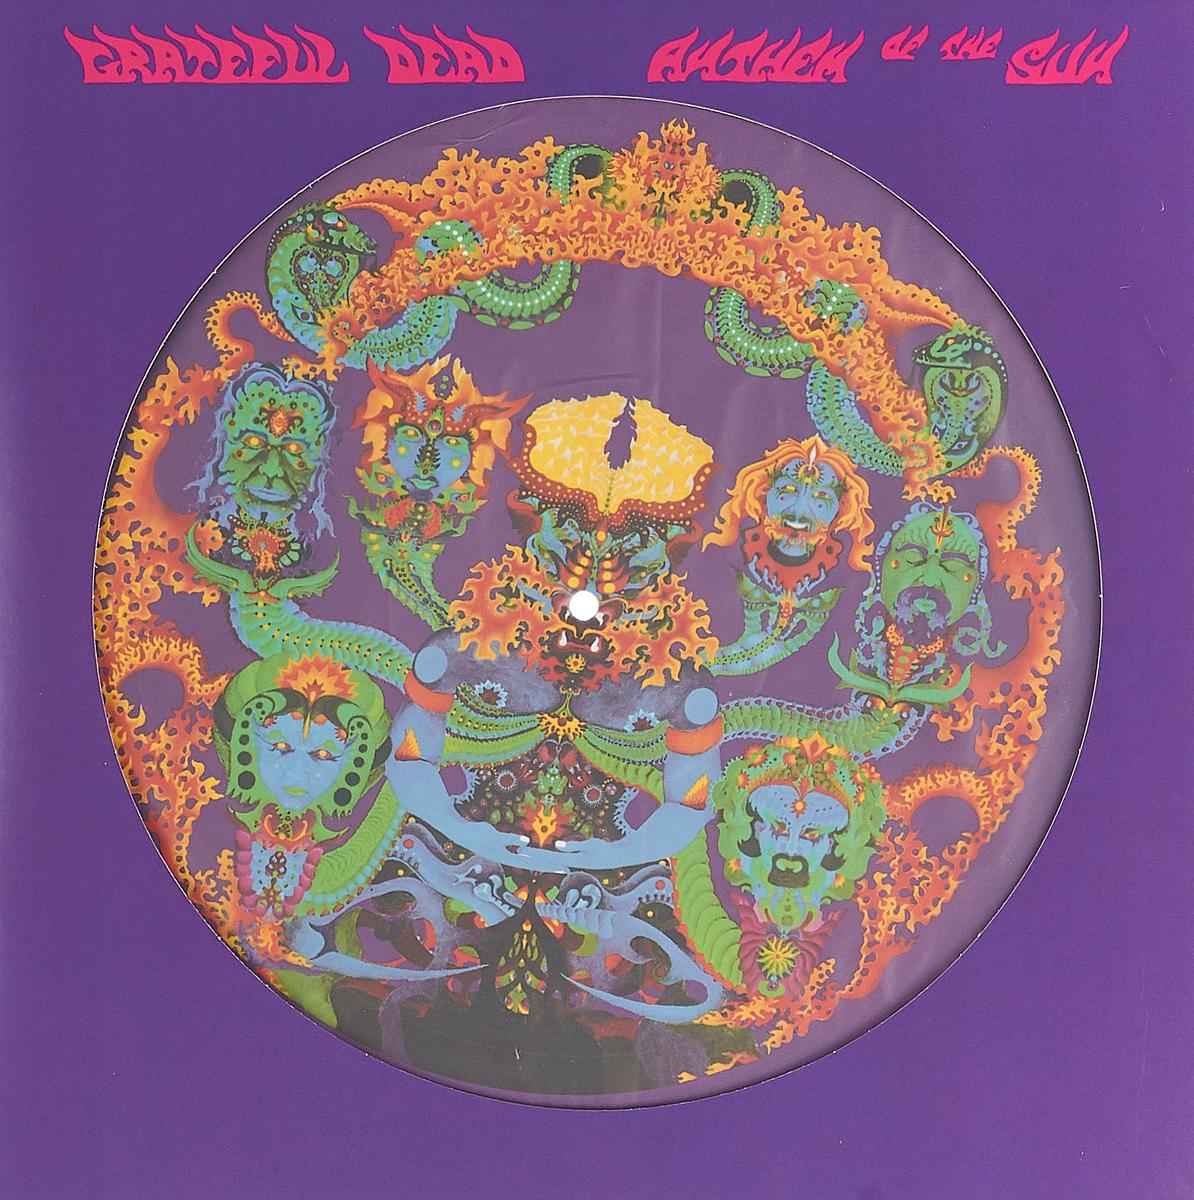 The Grateful Dead Grateful Dead. Anthem Of The Sun (50th Anniversary Edition) (Picture Disc) (LP) blackout 50th anniversary deluxe edition lp cd